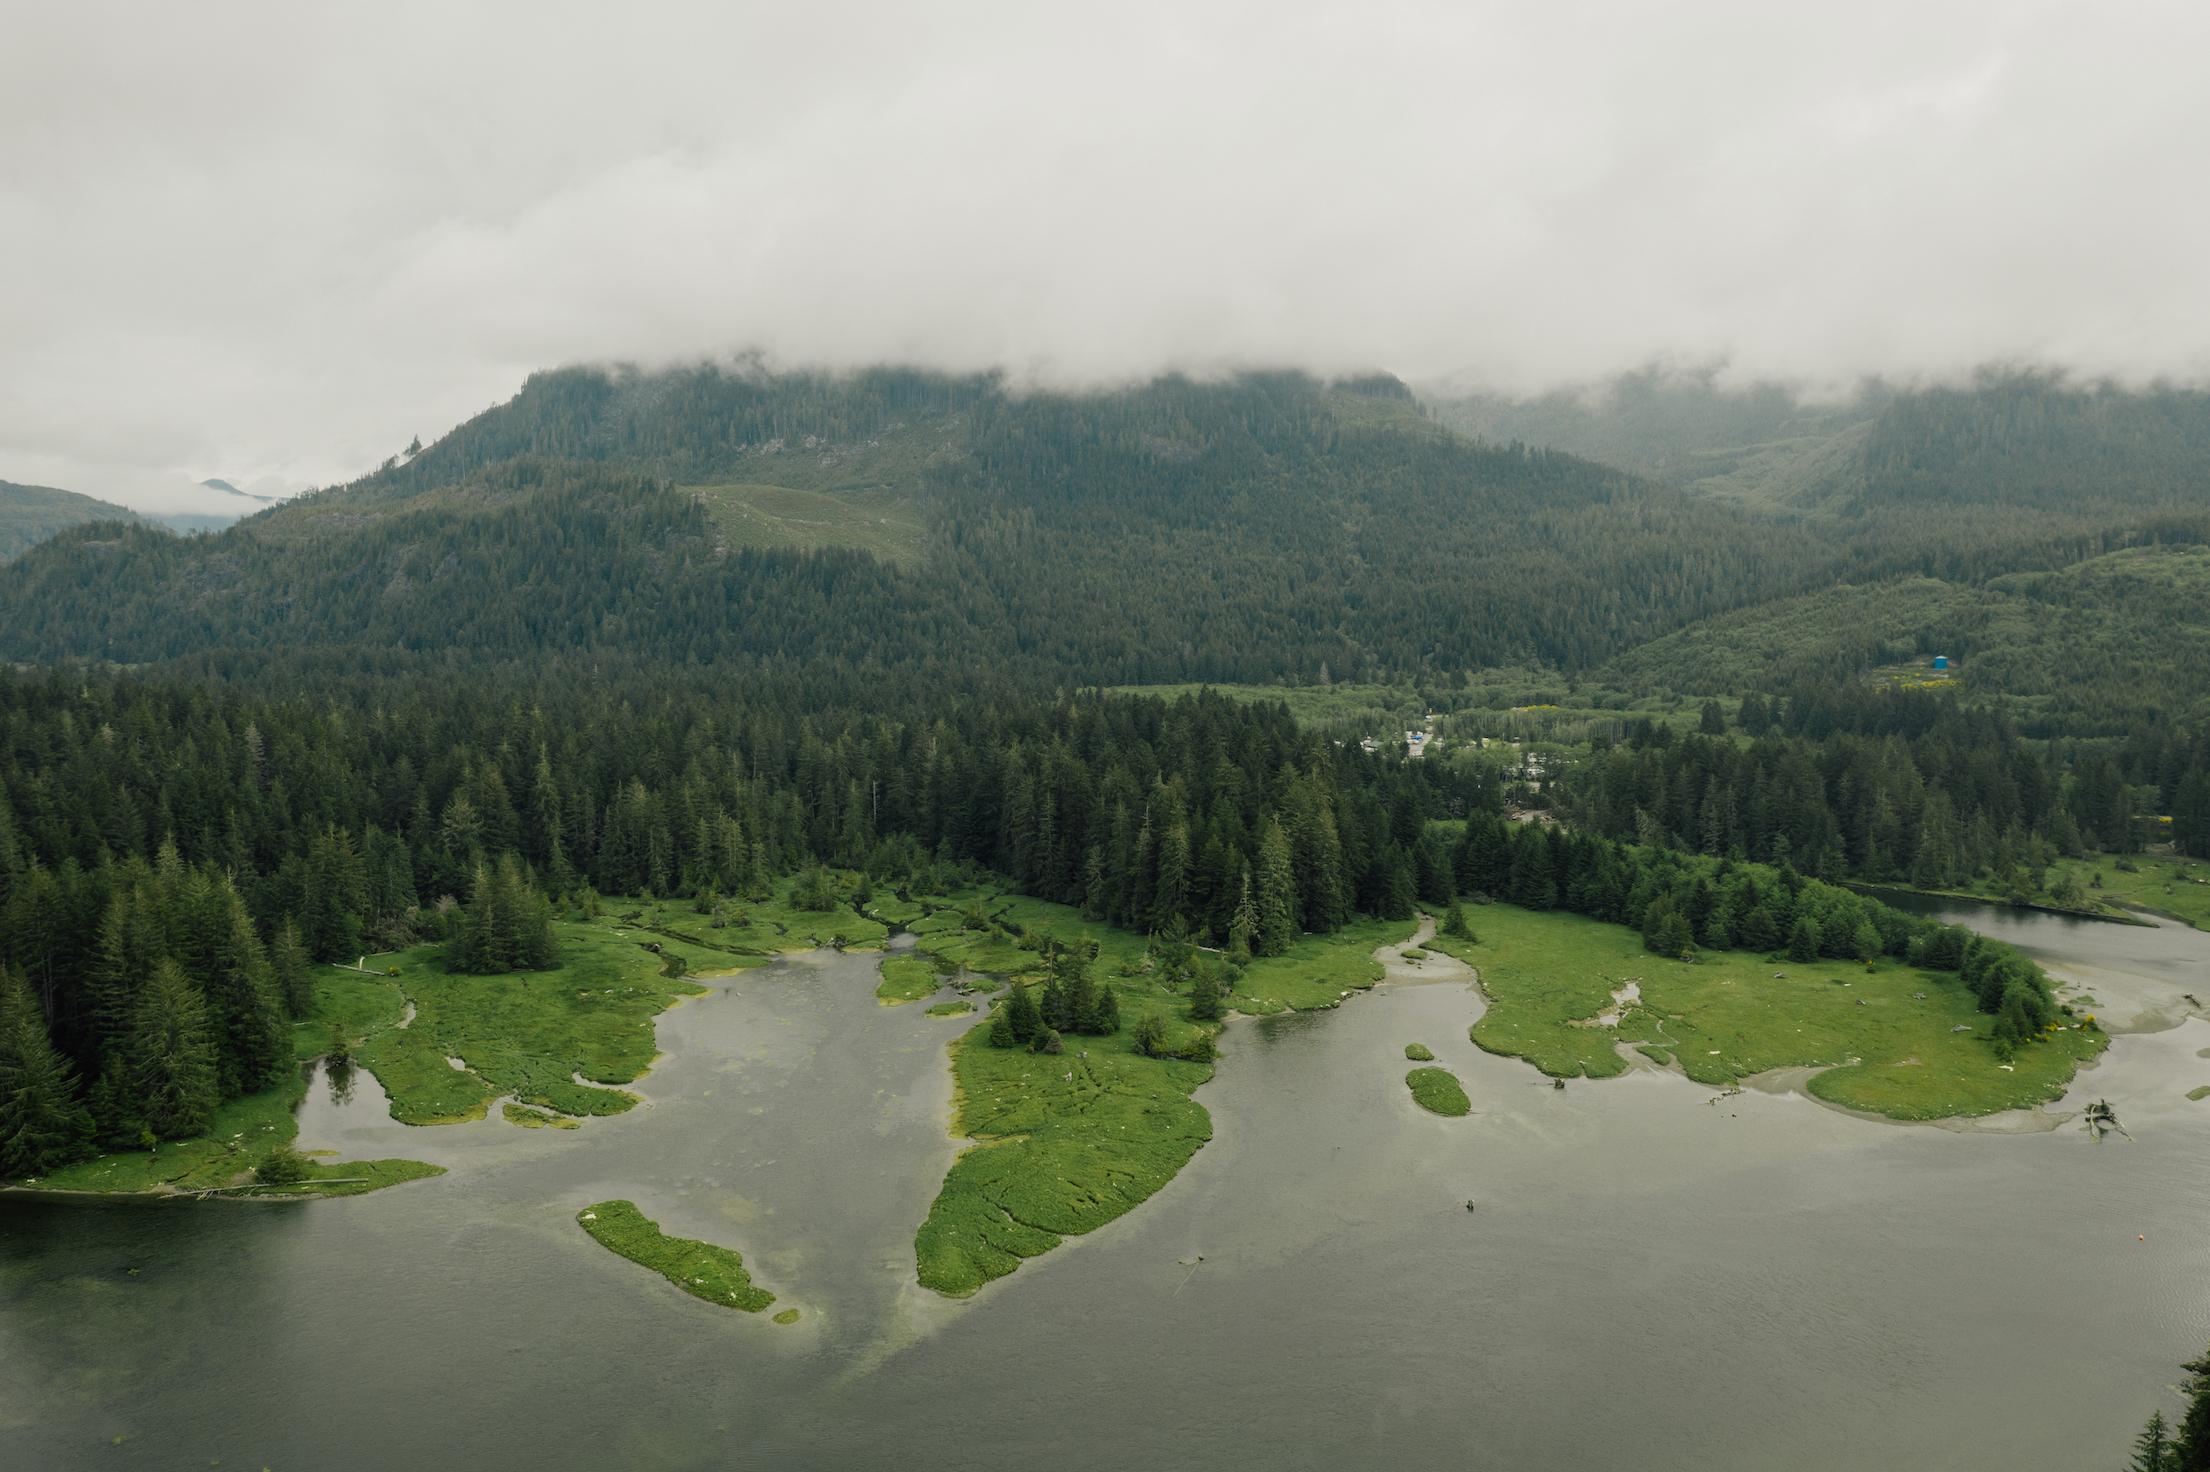 A view of Pacheedaht territory